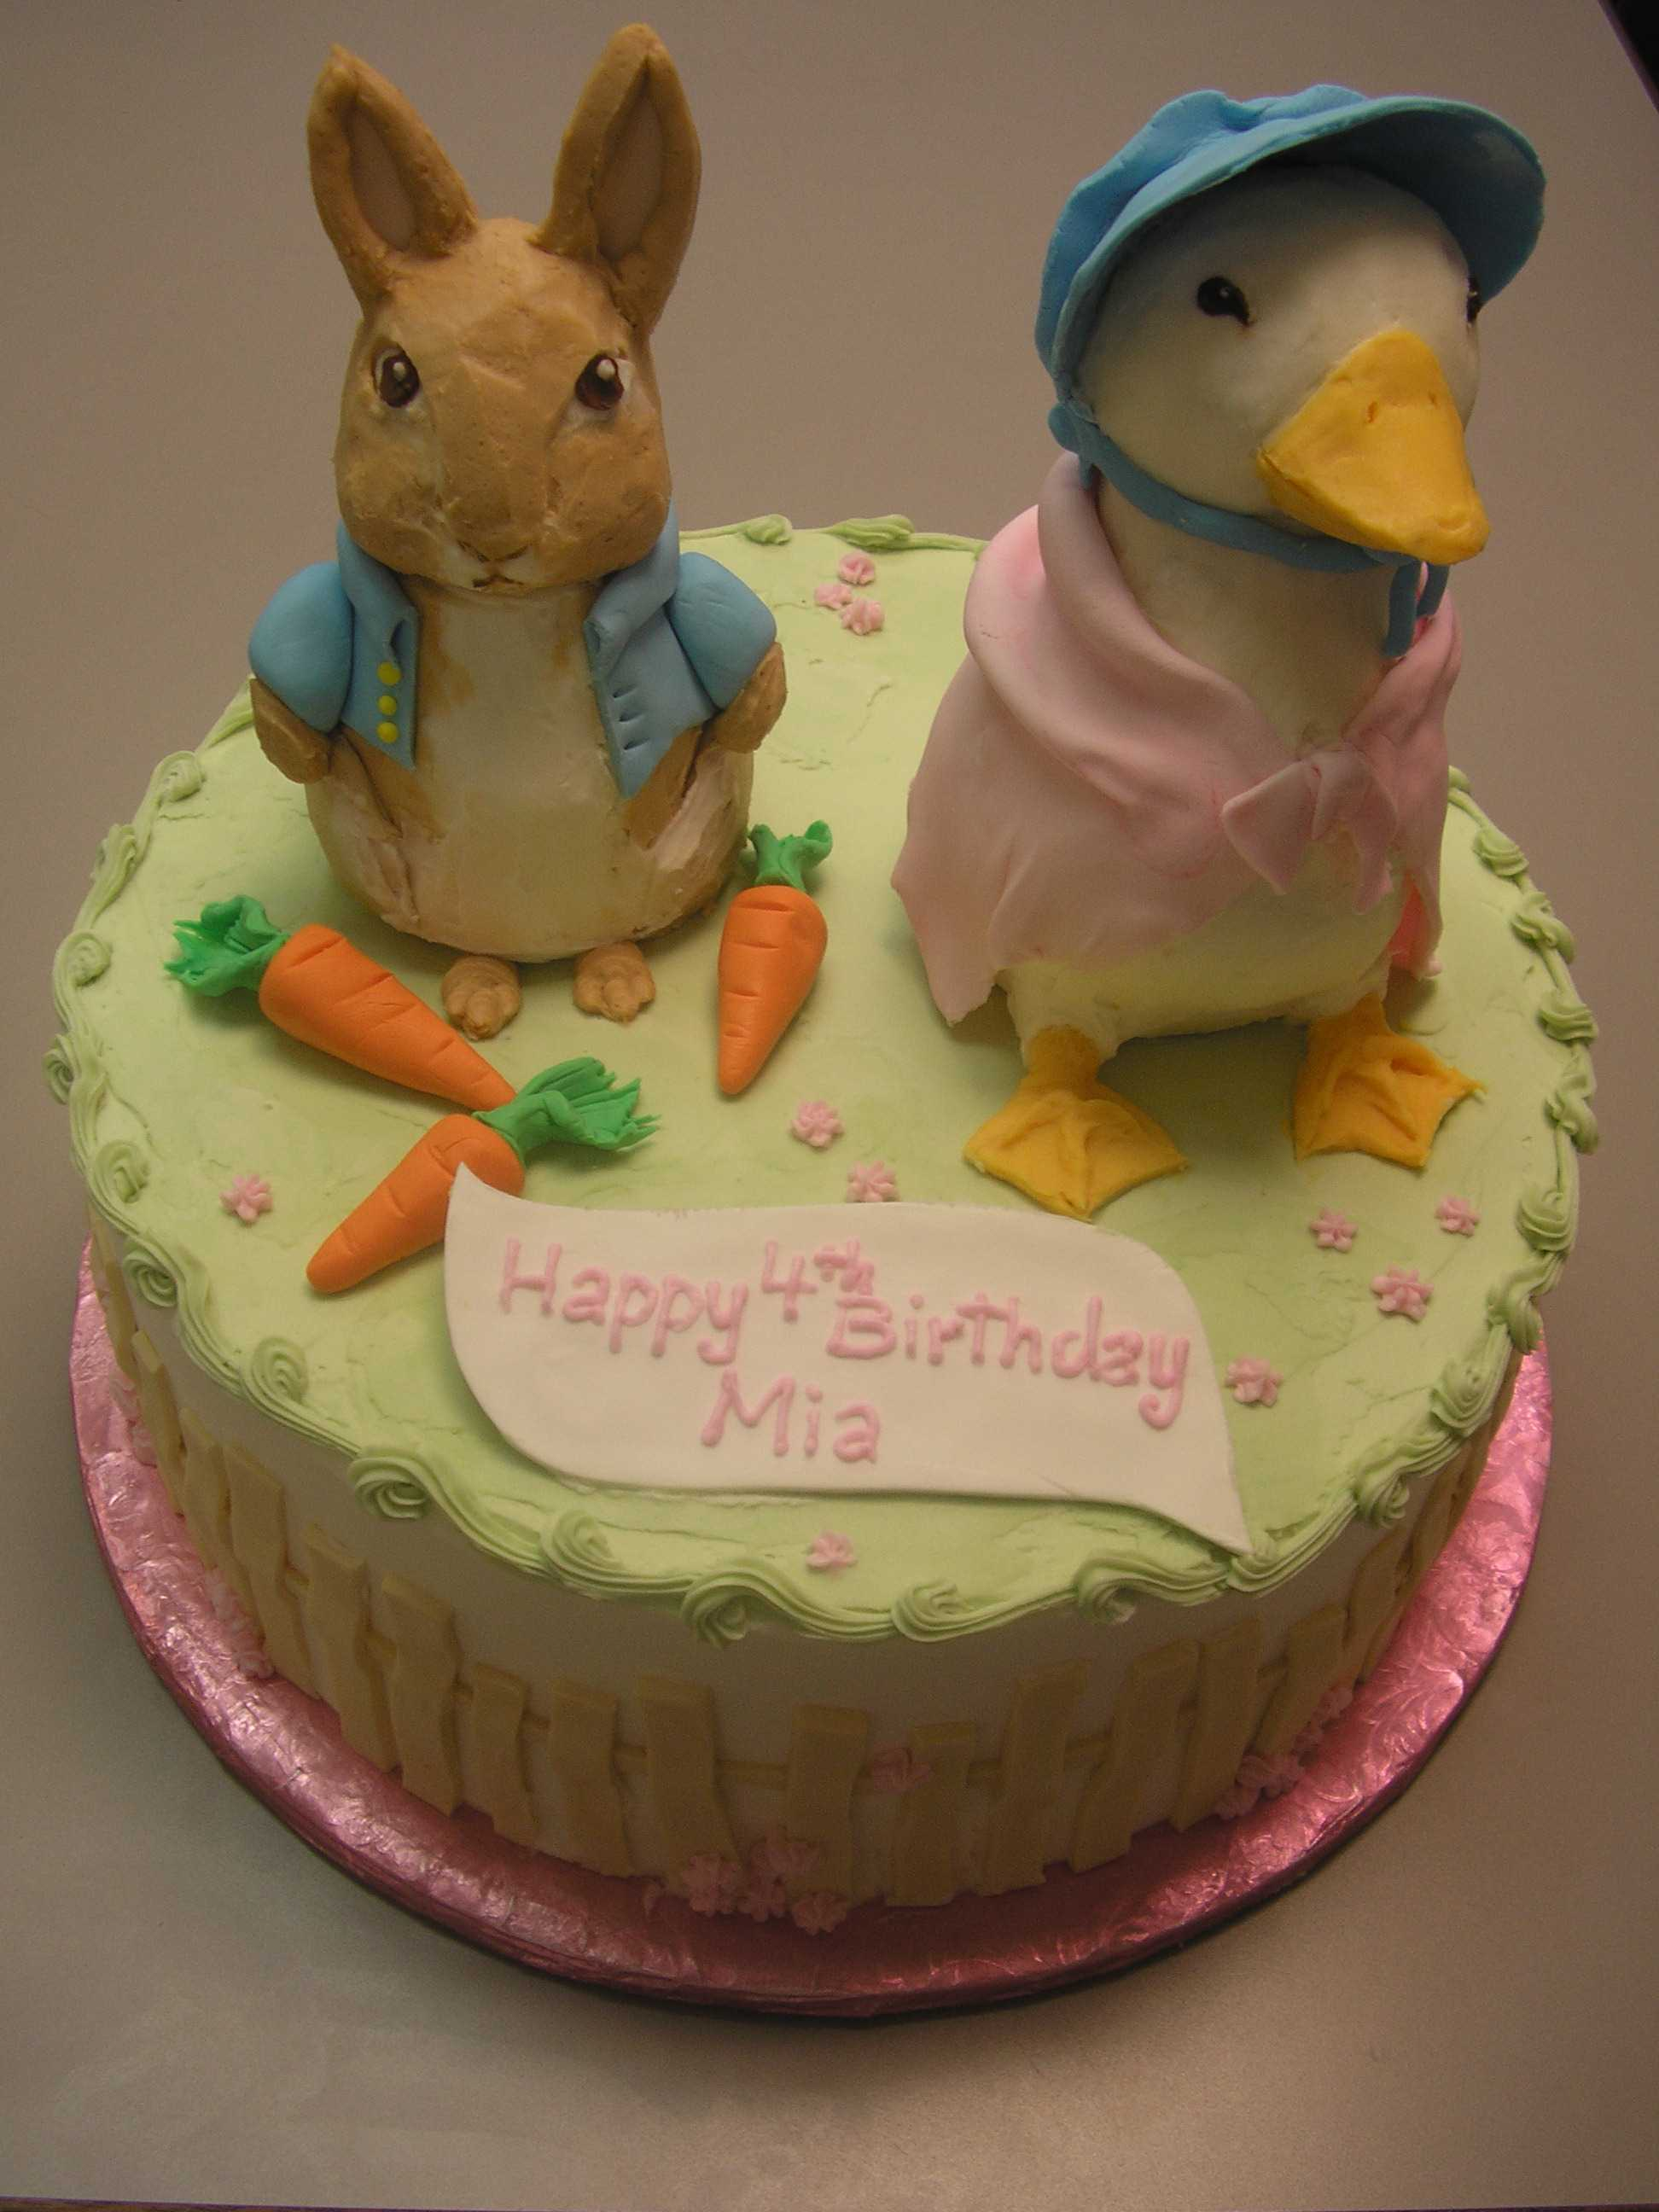 3D Beatrix Potter cake